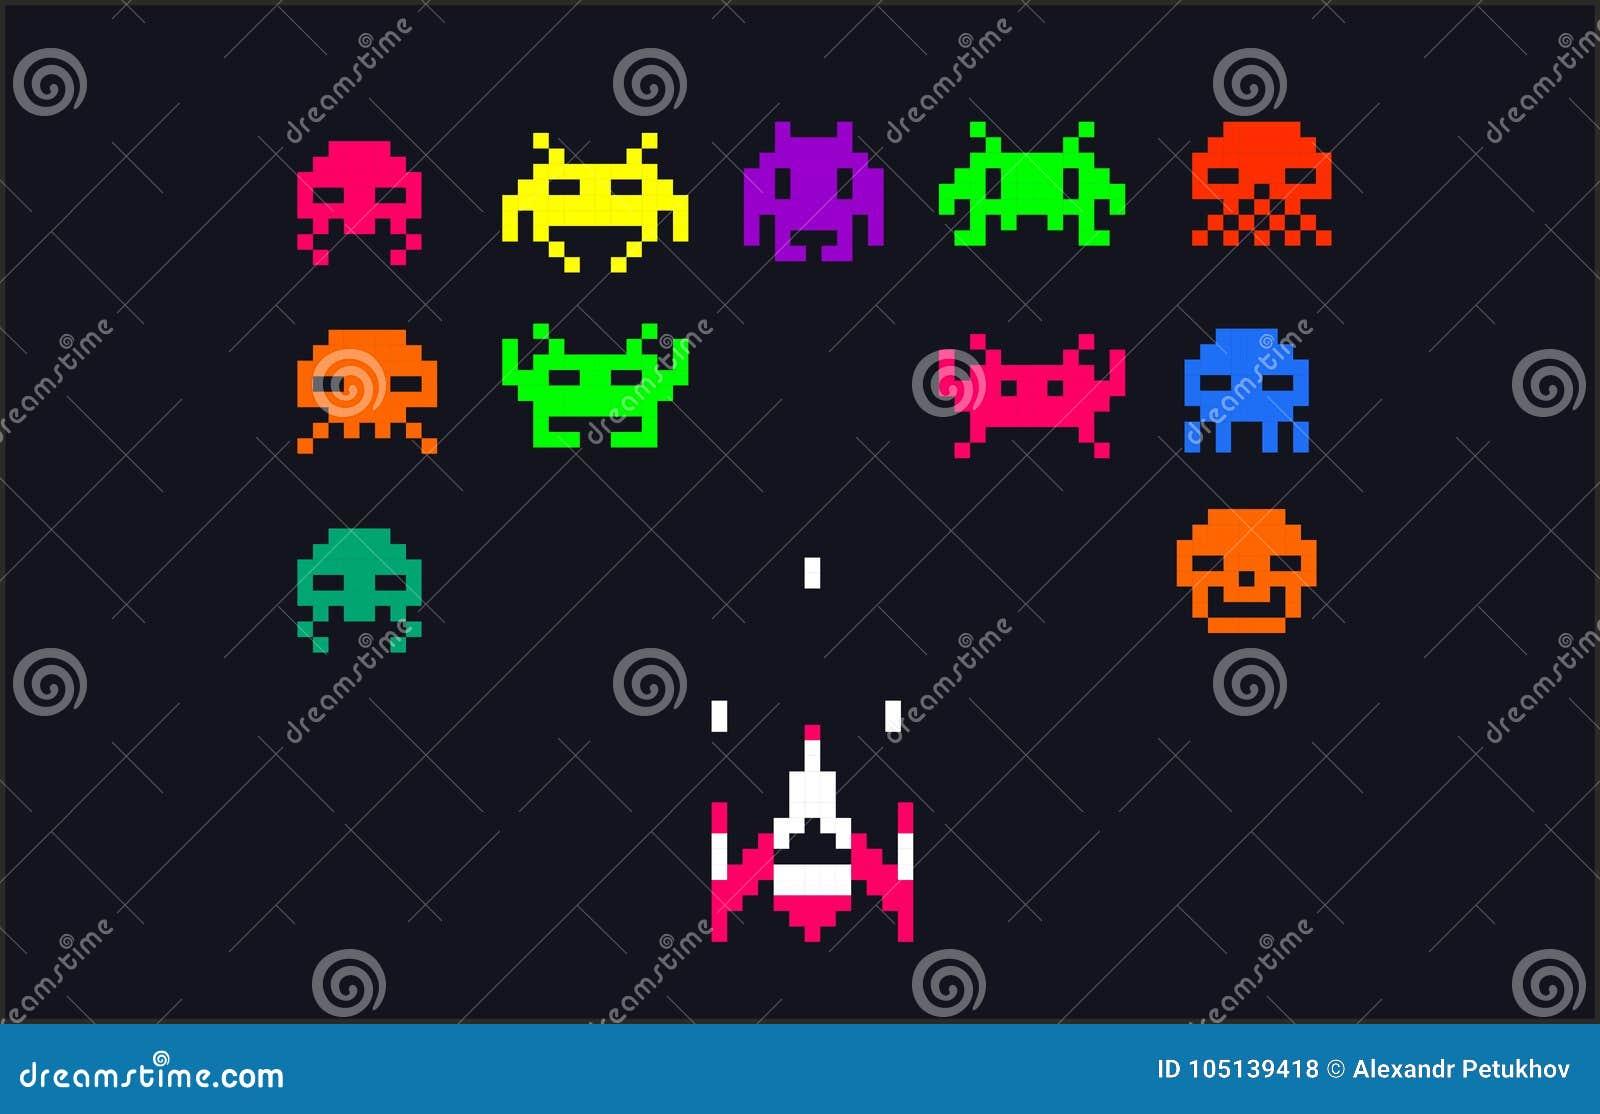 8 Art Elements : Video game bit space aliens spaceship pixel art with